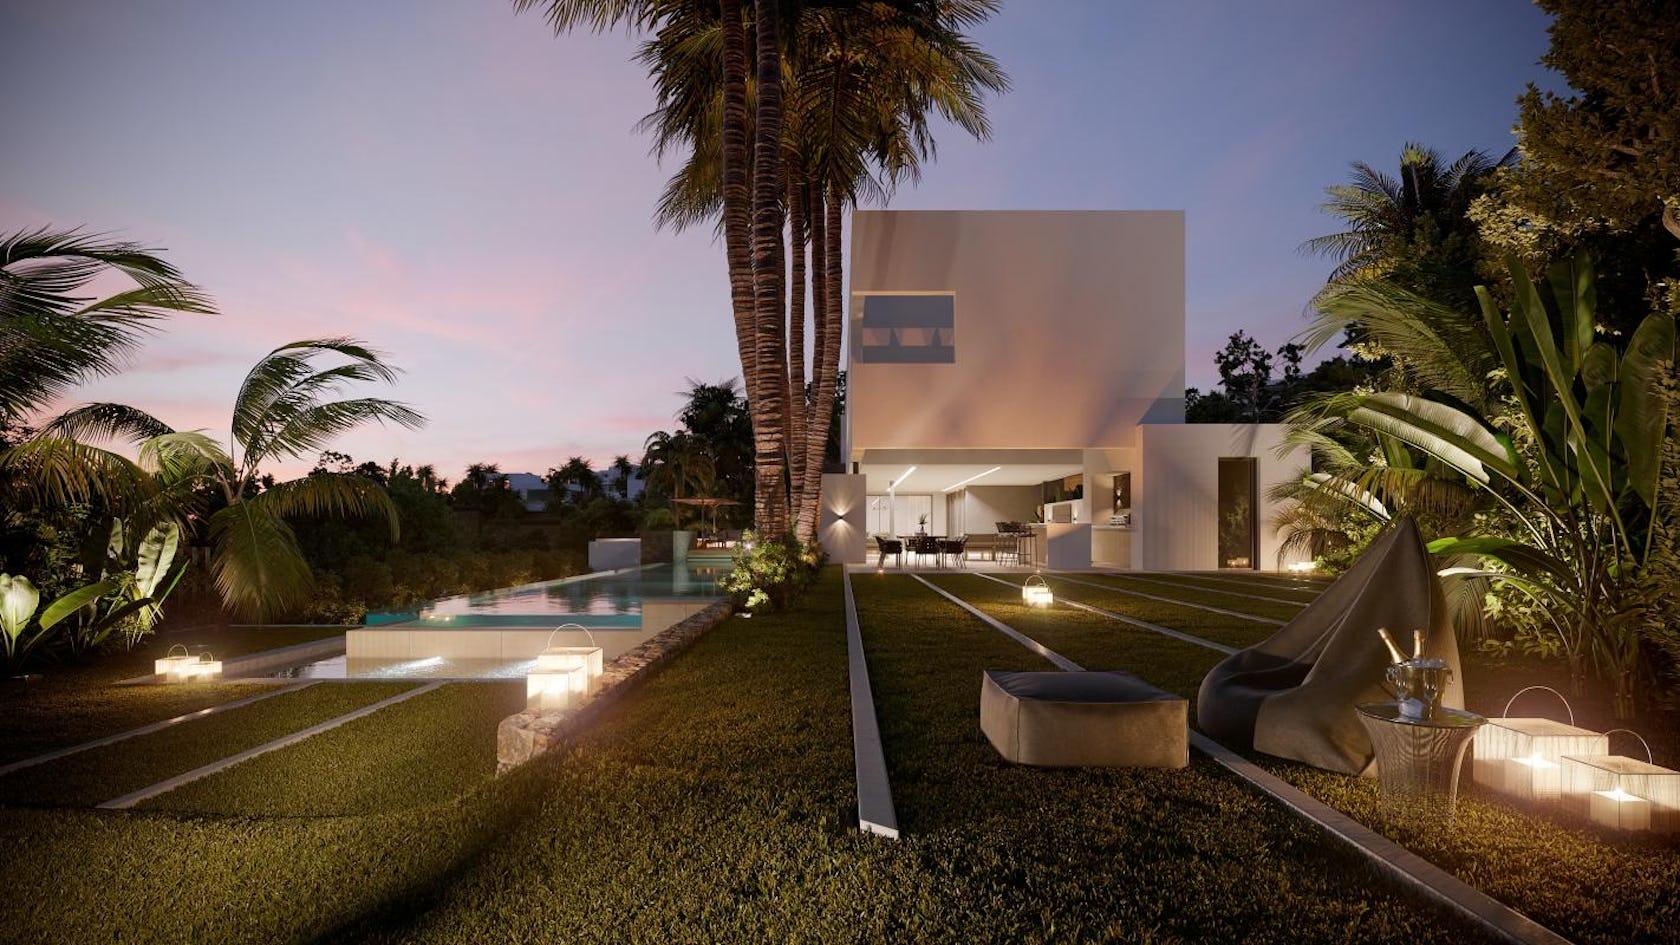 building hotel resort plant tree arecaceae palm tree